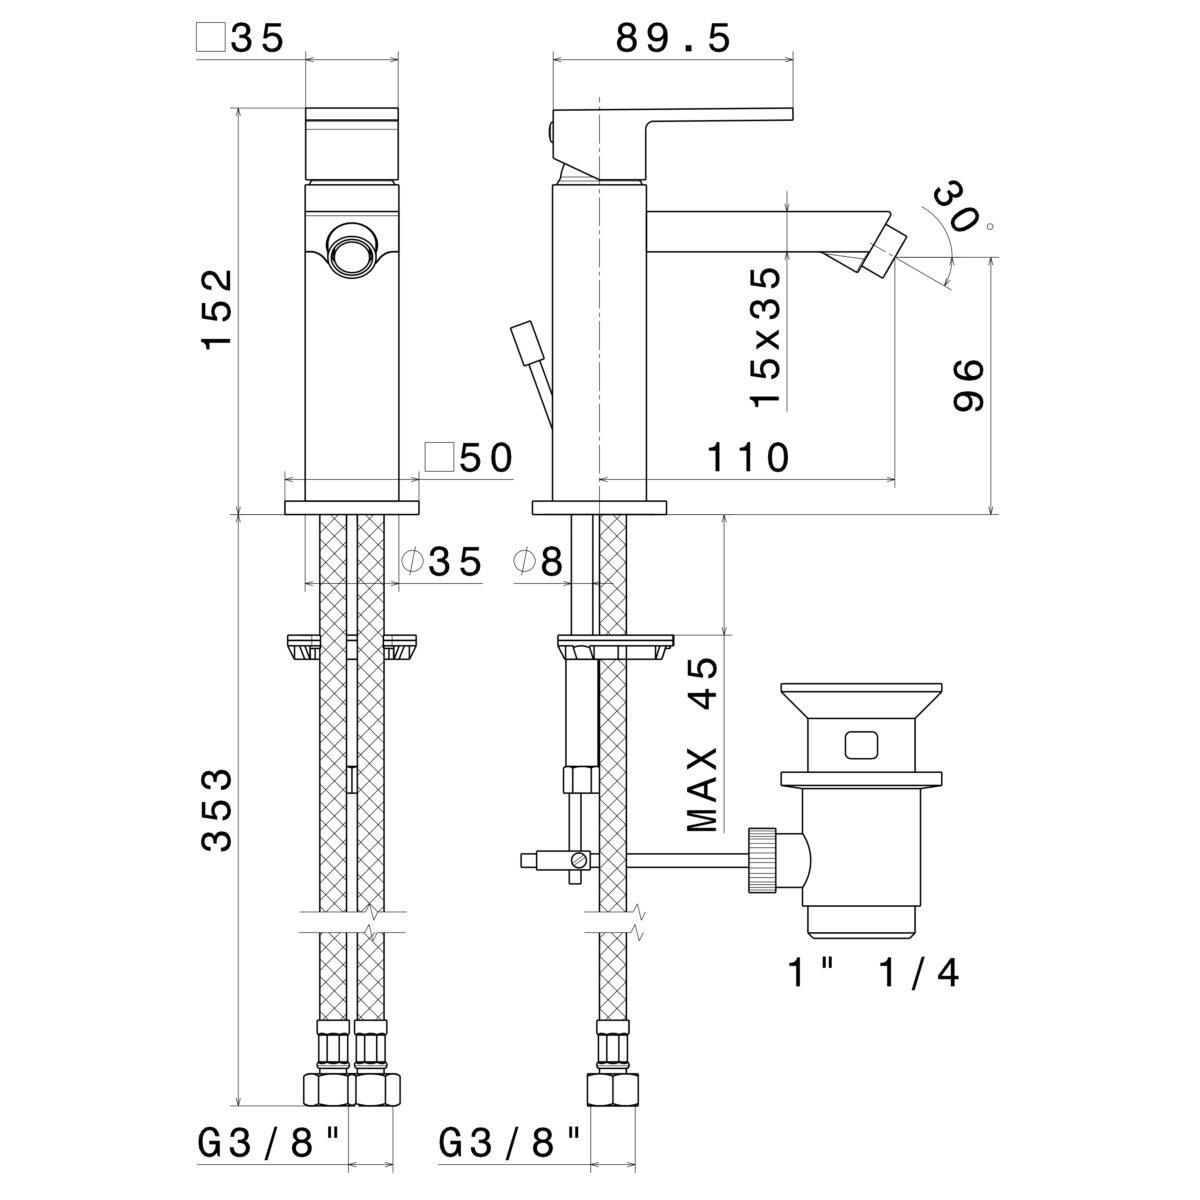 66425 Newform Ergo Q Bidet Mixer_Stiles_TechDrawing_Image